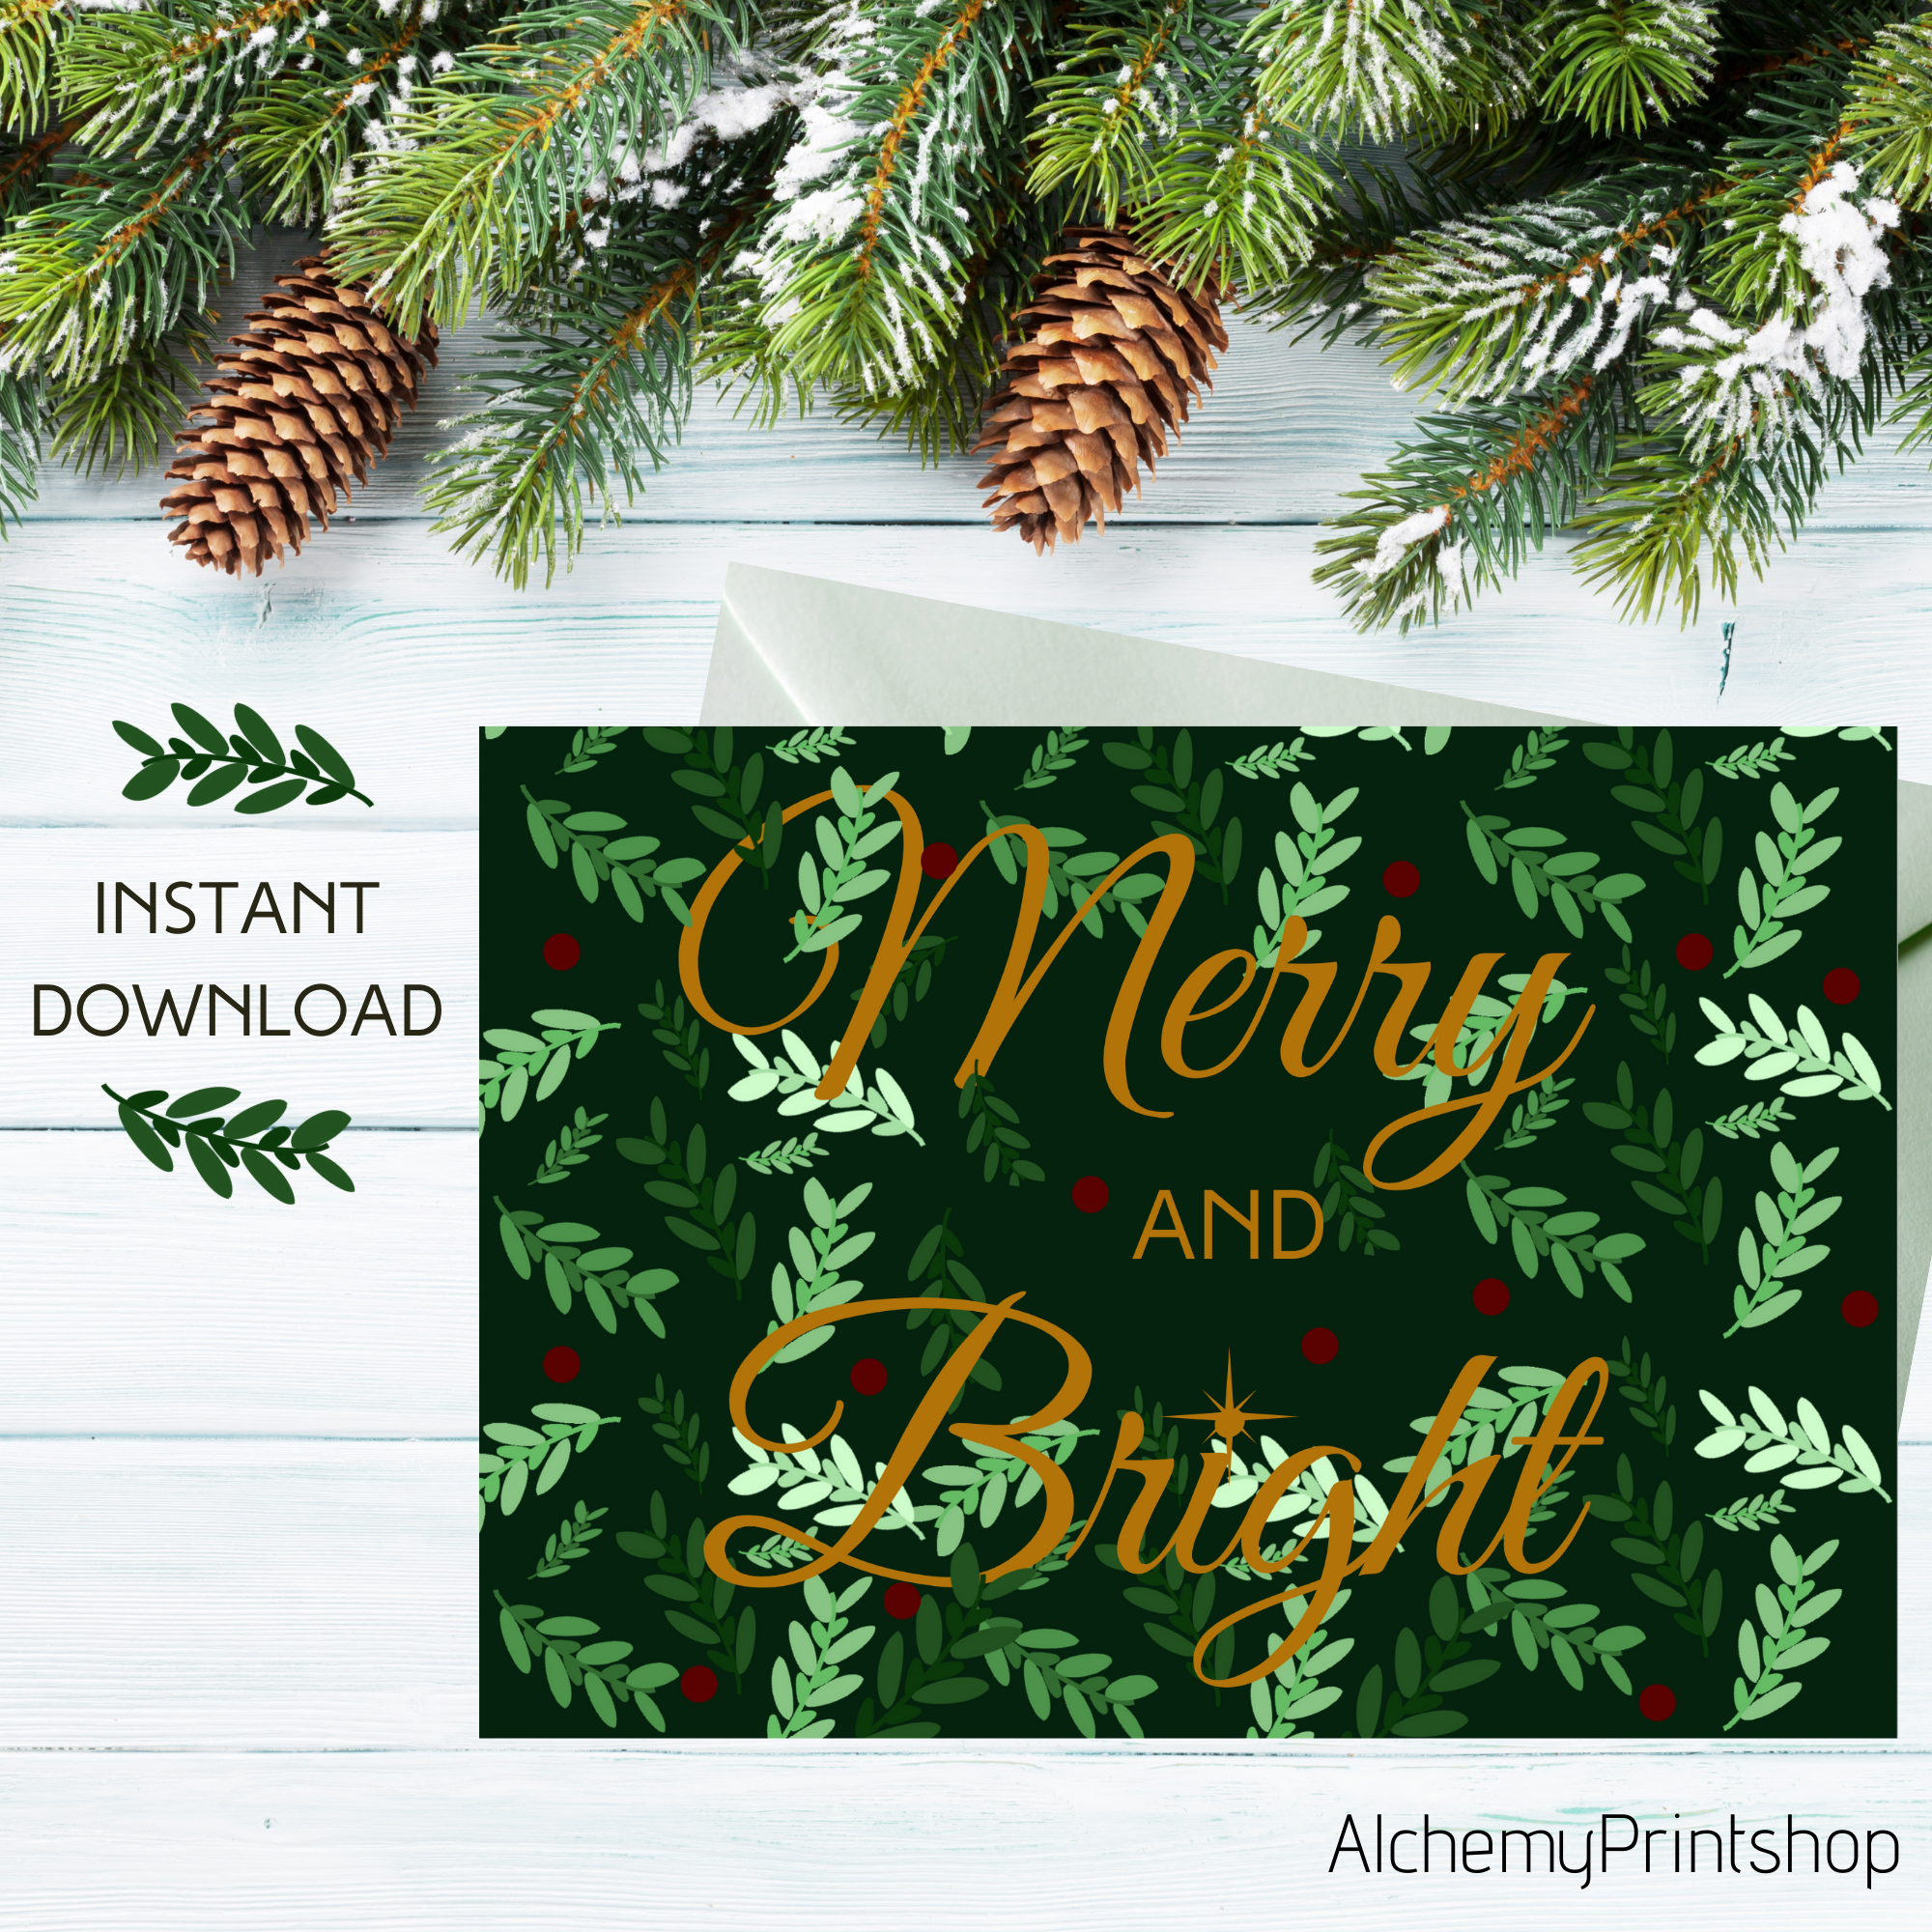 Merry And Bright Holiday Party Invitation Christmas Party Etsy Winter Birthday Invitations Holiday Party Invitations Christmas Party Invitations